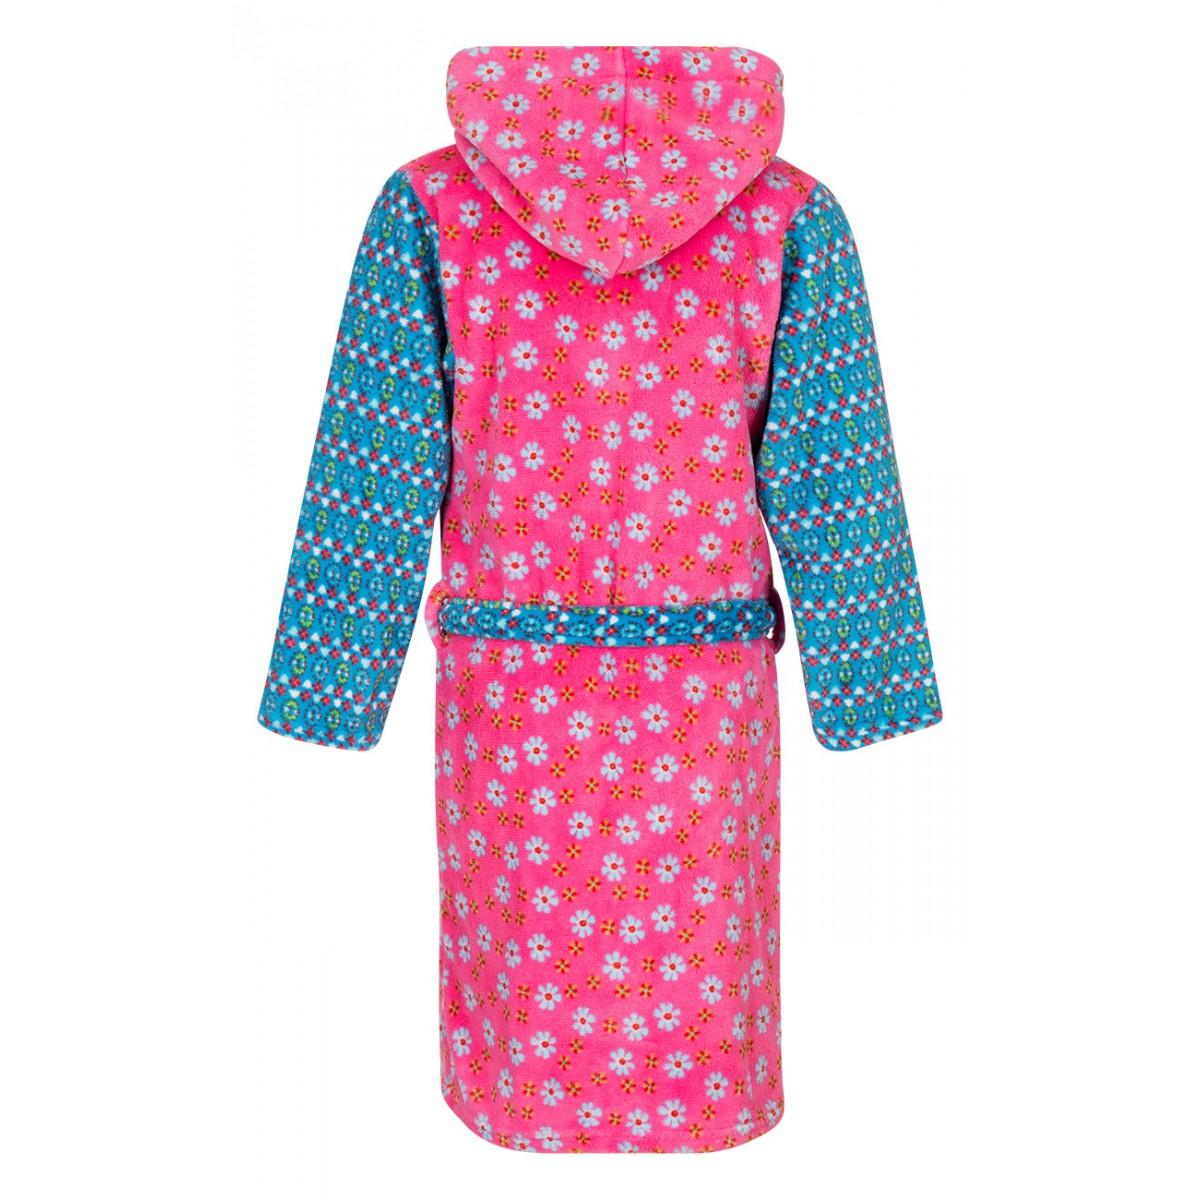 bjnl -Bloemen kinderbadjas